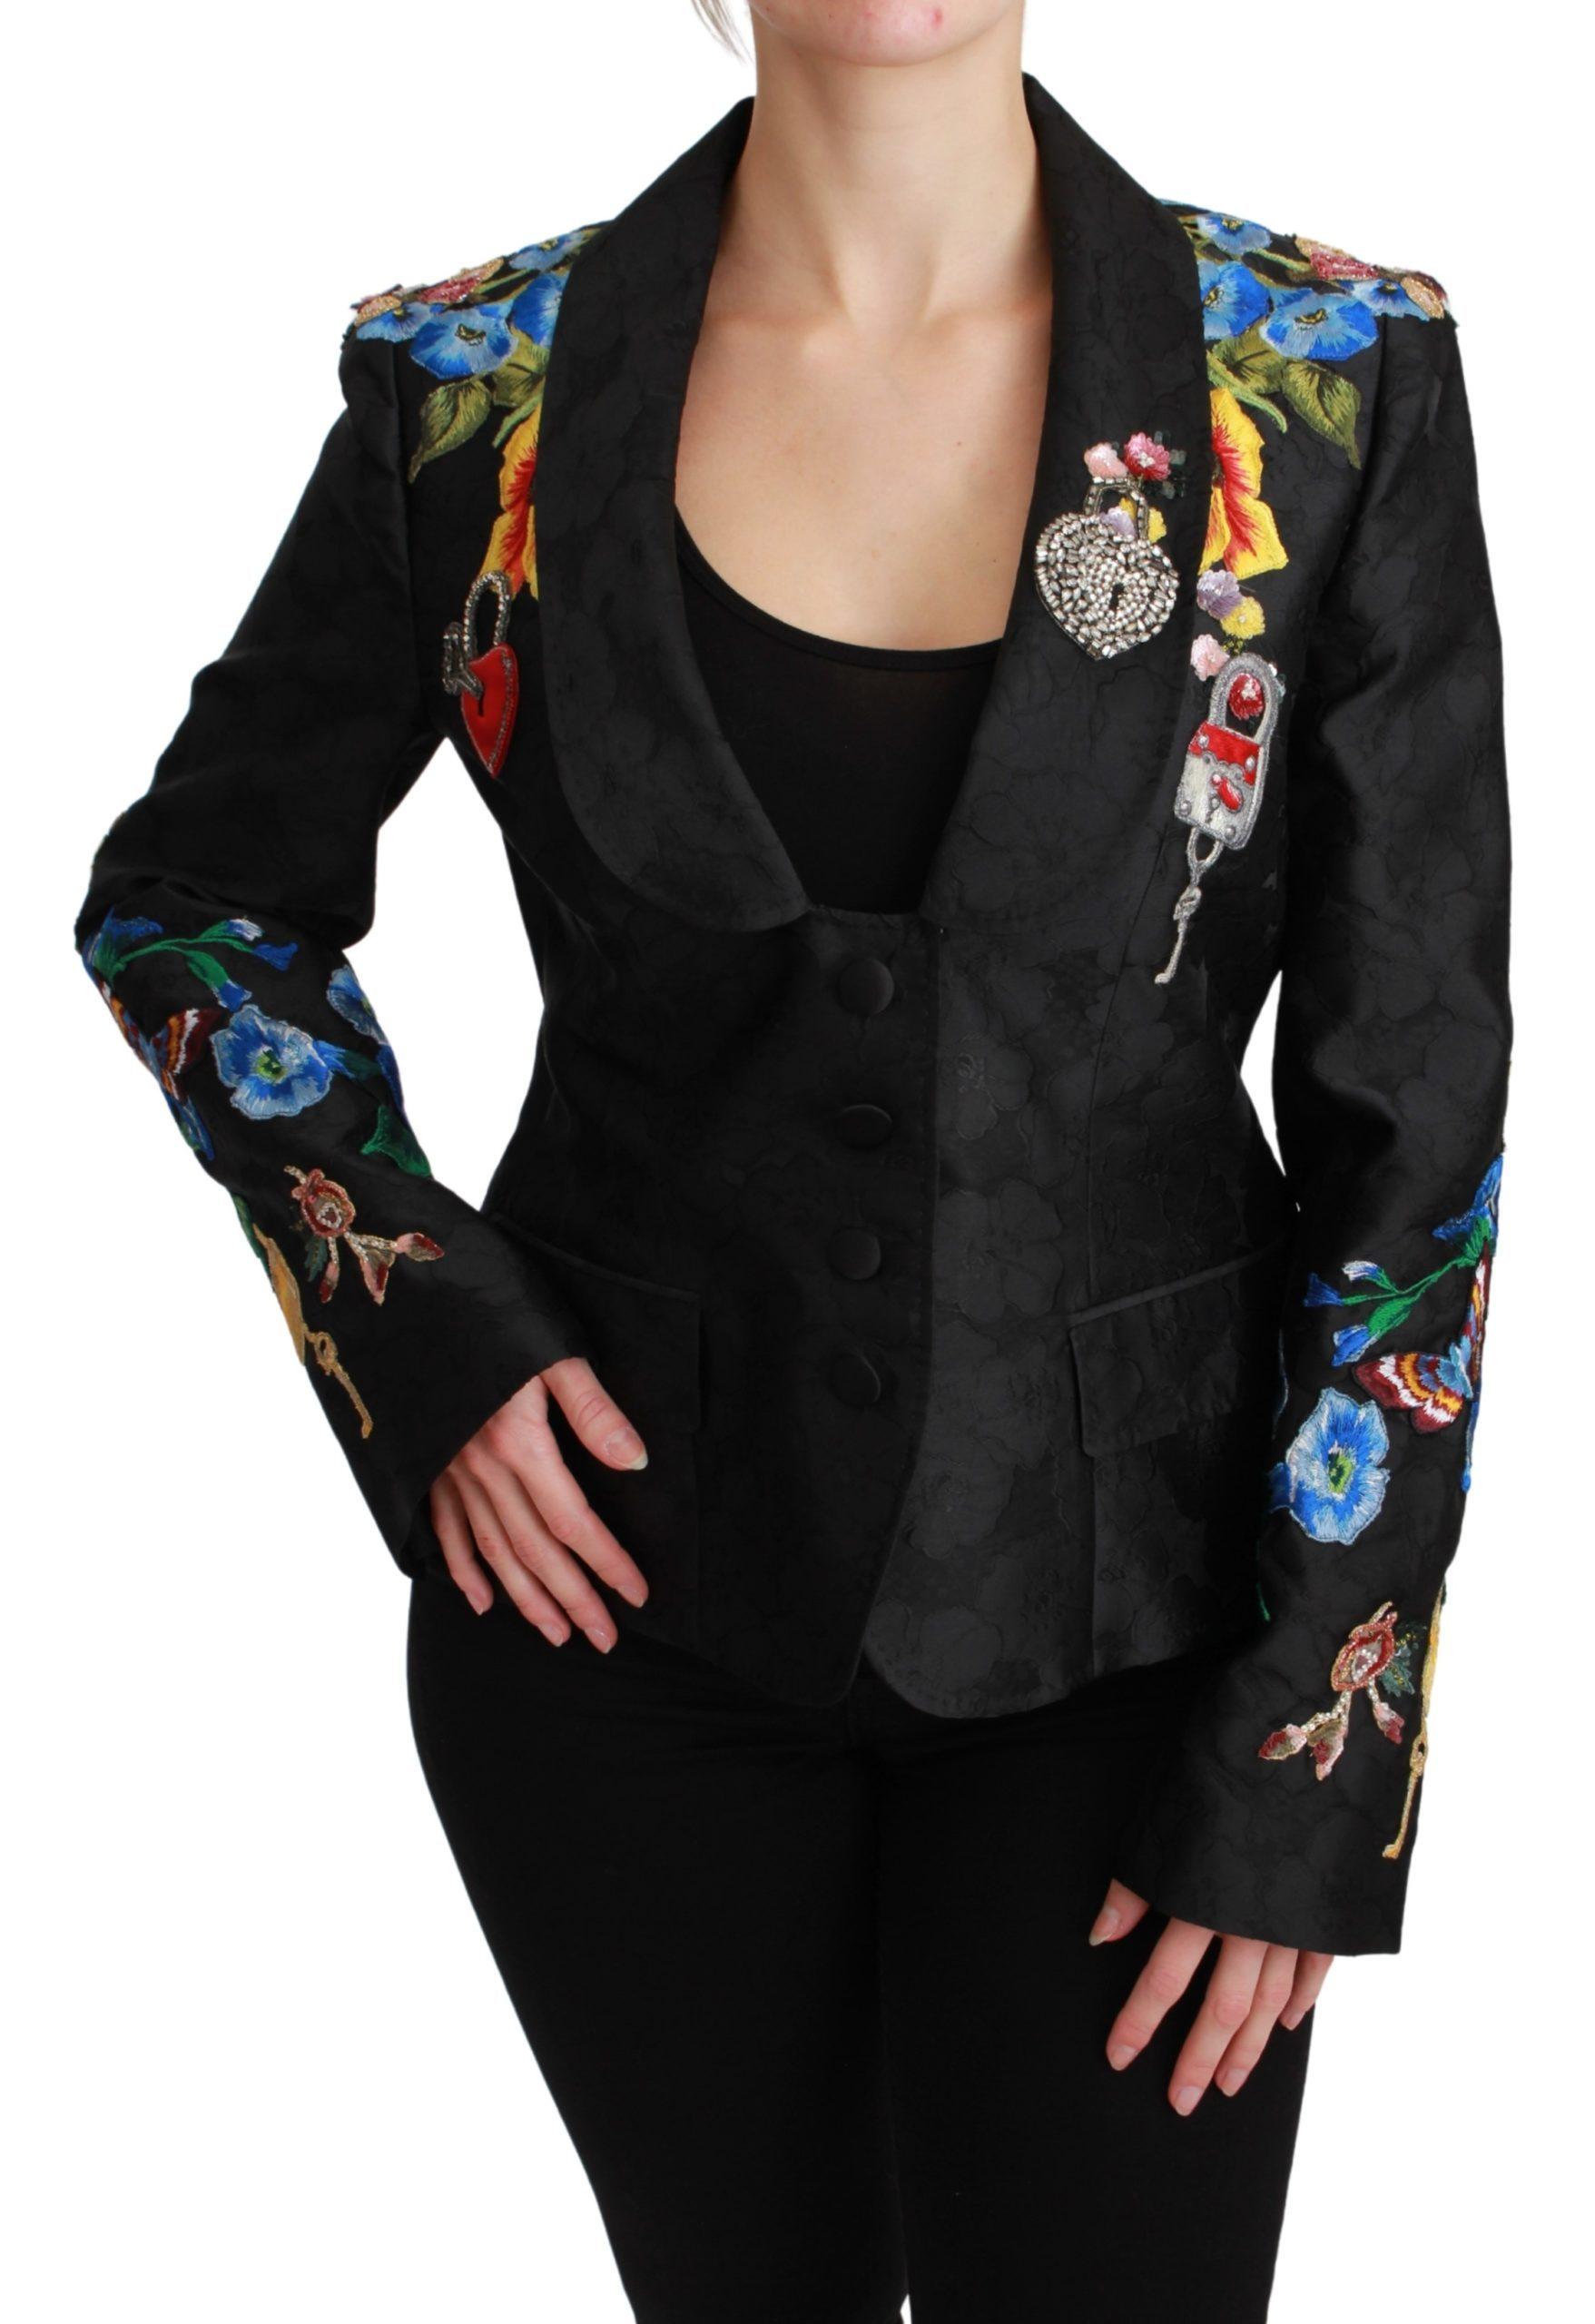 Dolce & Gabbana Brocade Crystal Blazer Black JKT2628-46 - IT46 | L